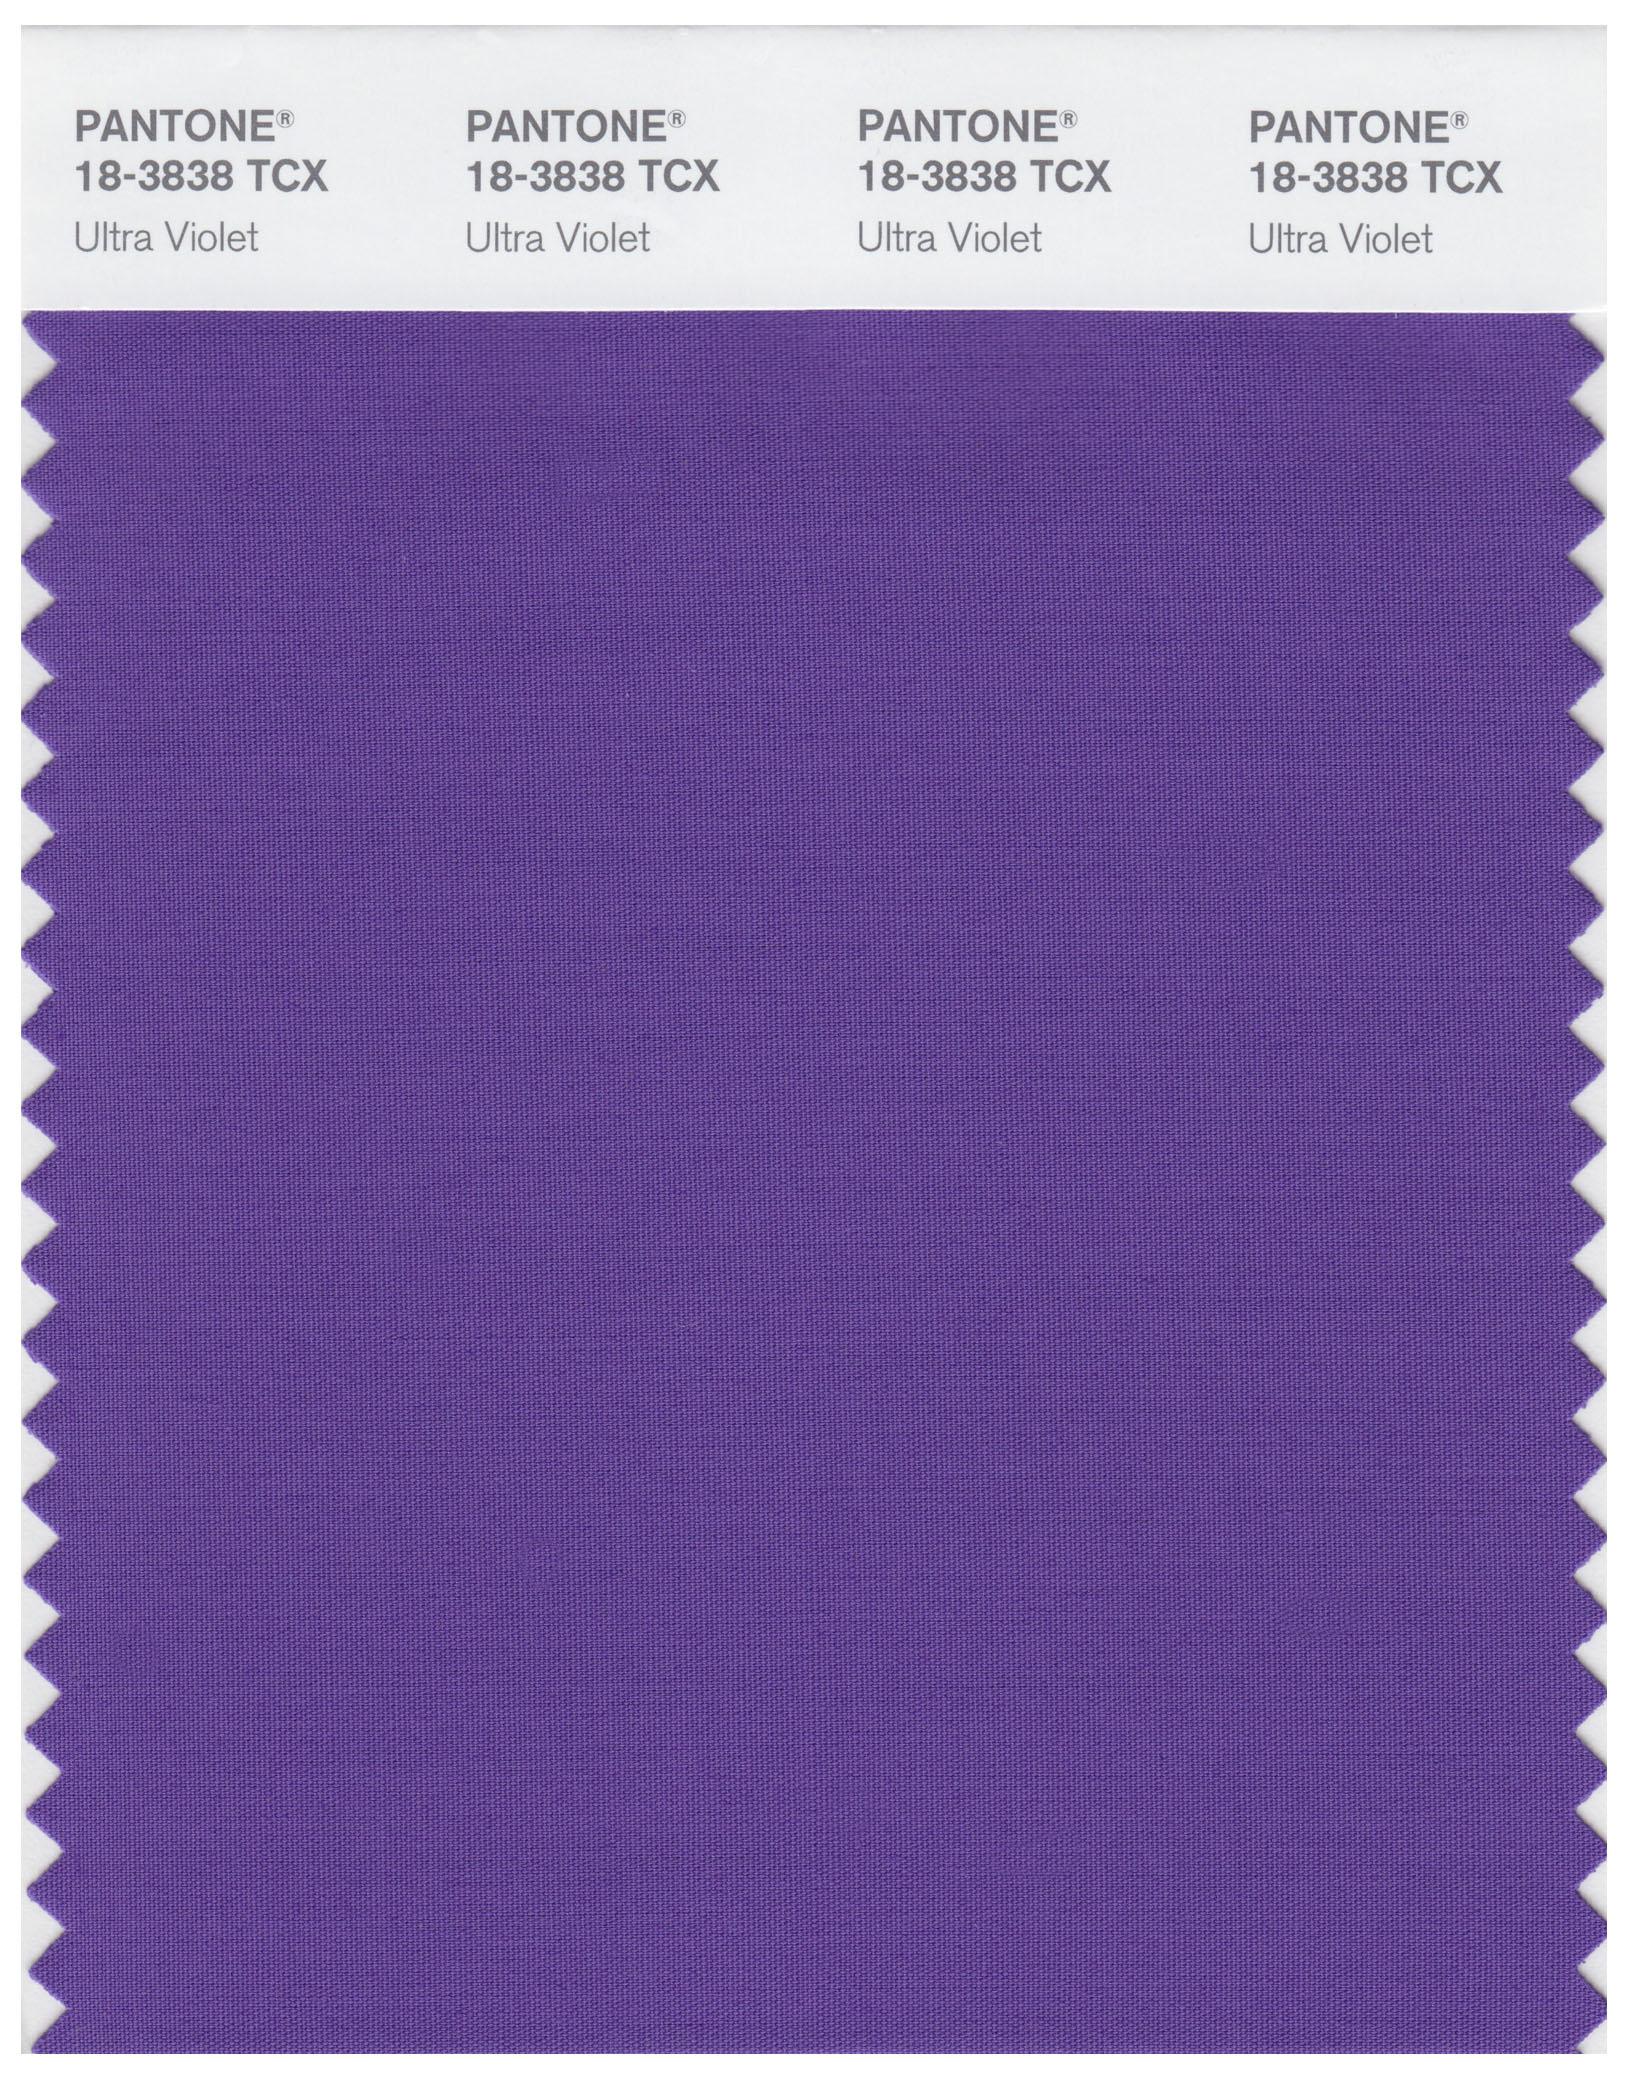 18-3838_ultraviolet_1.jpg